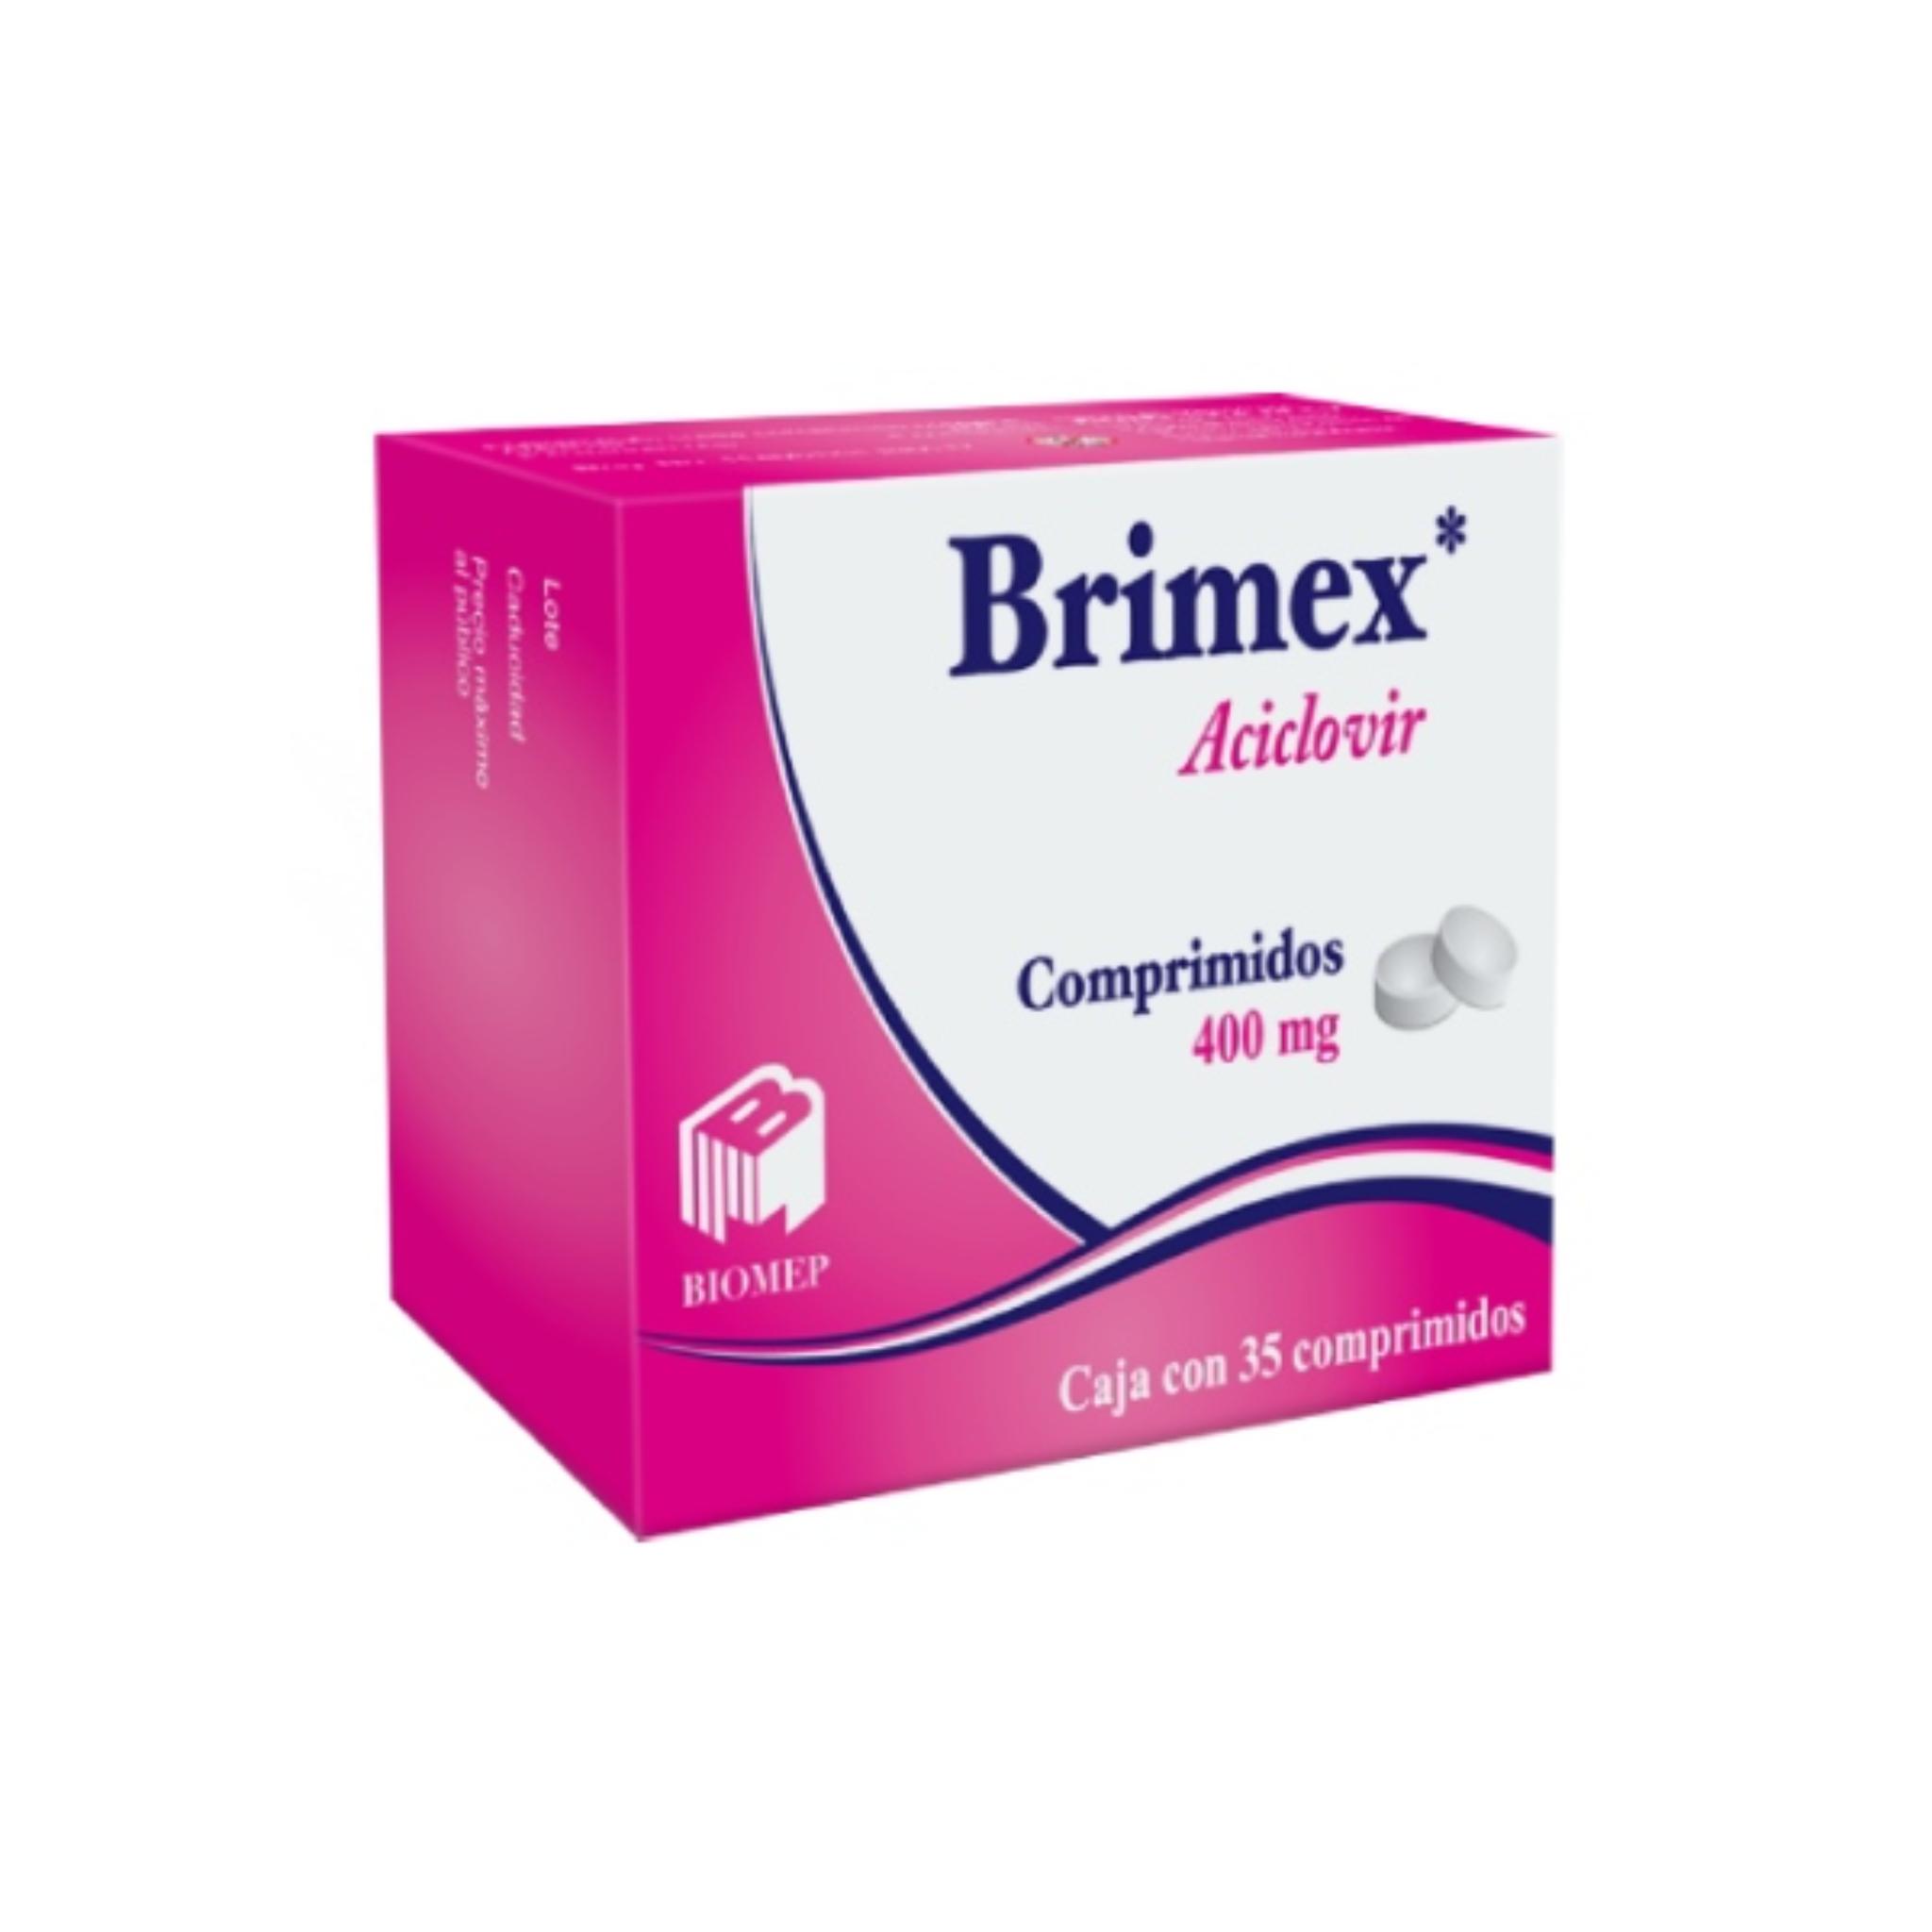 Brimex 400Mg C/35 T Aciclovir